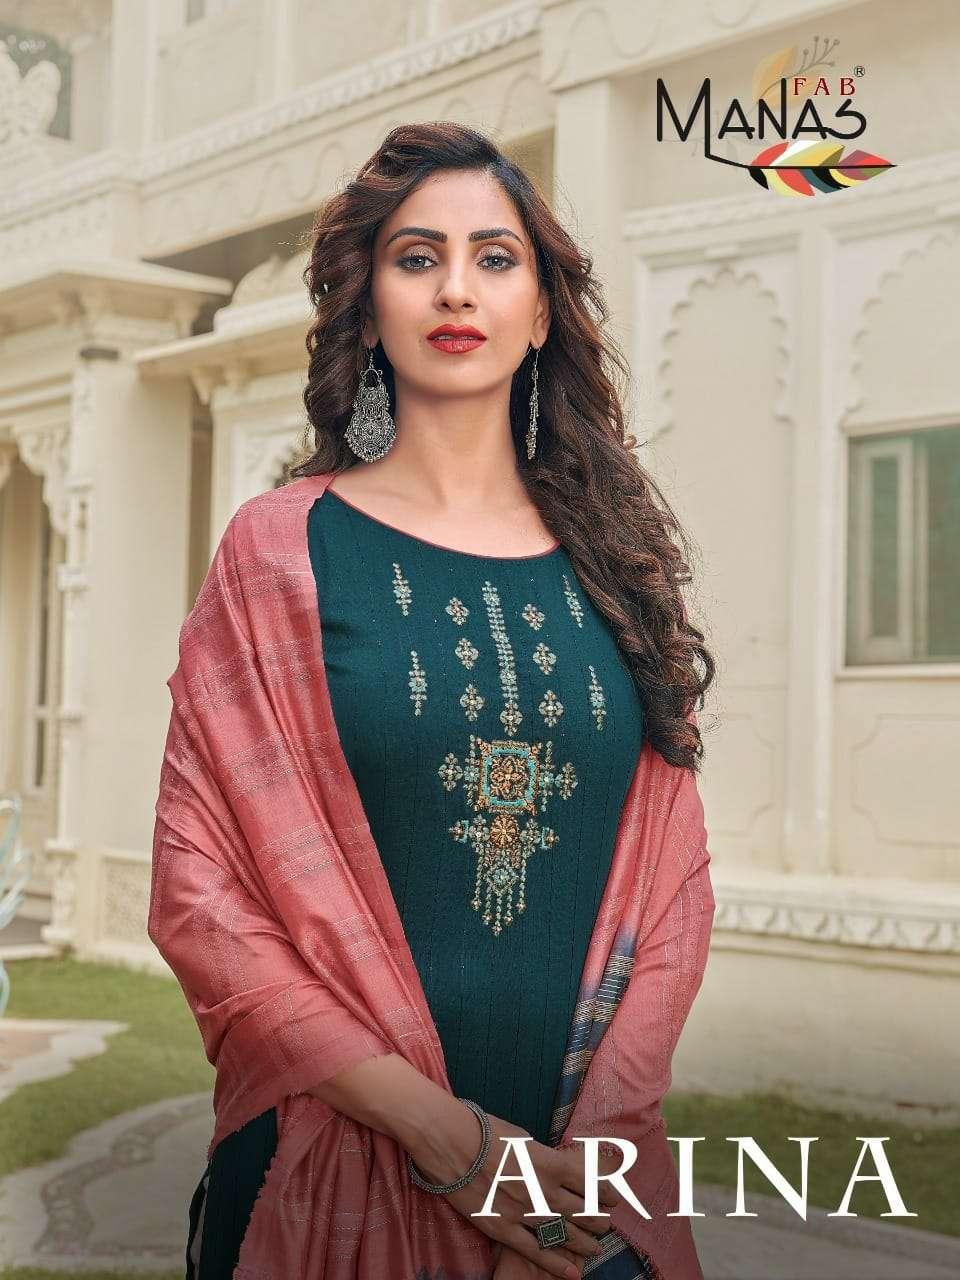 Arina By Manas Fab Fancy Weaving Charming Look Readymade Salwar Kameez